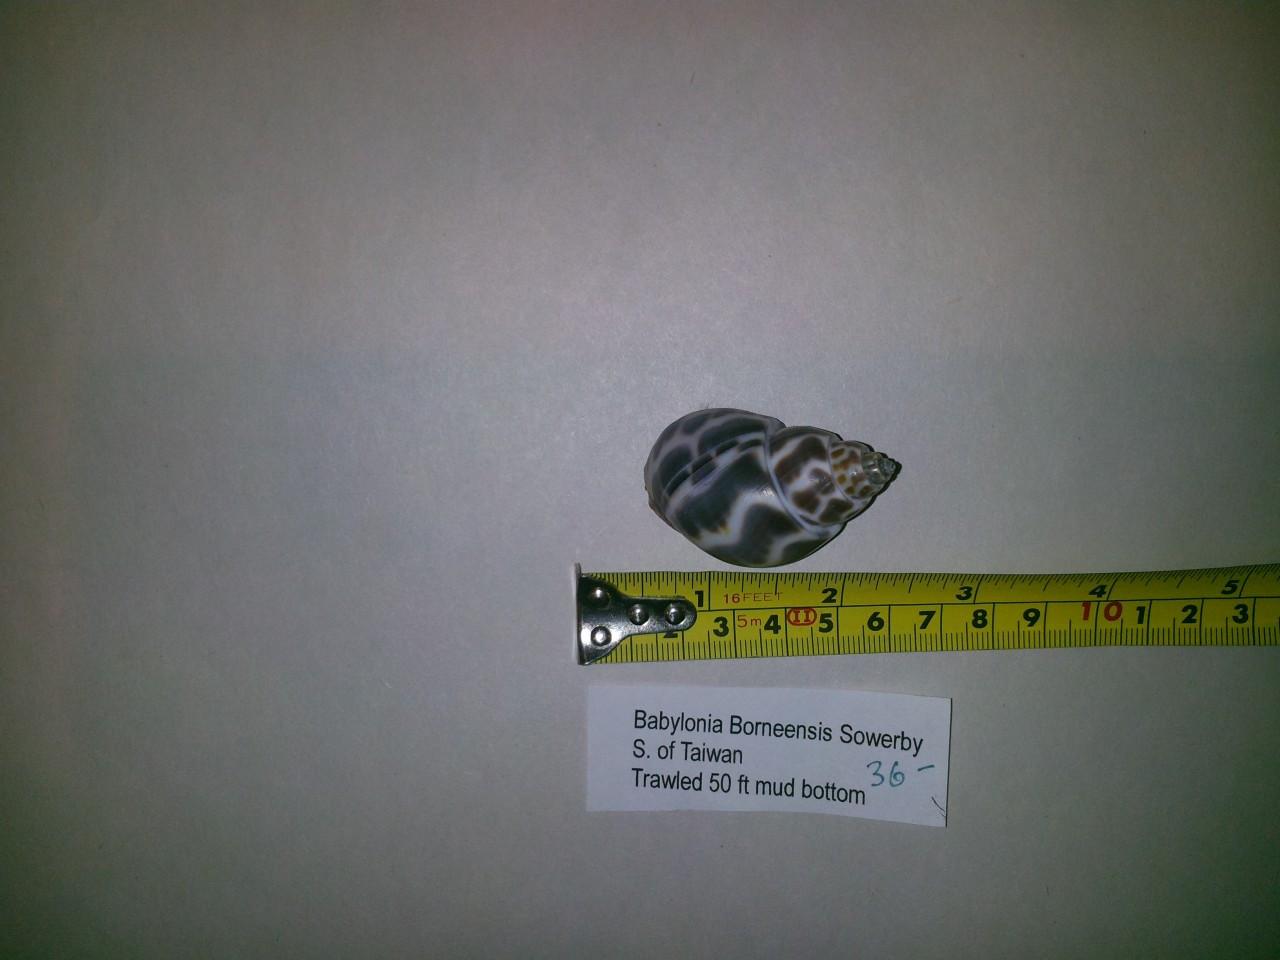 Babylonia Borneensis Sowerby